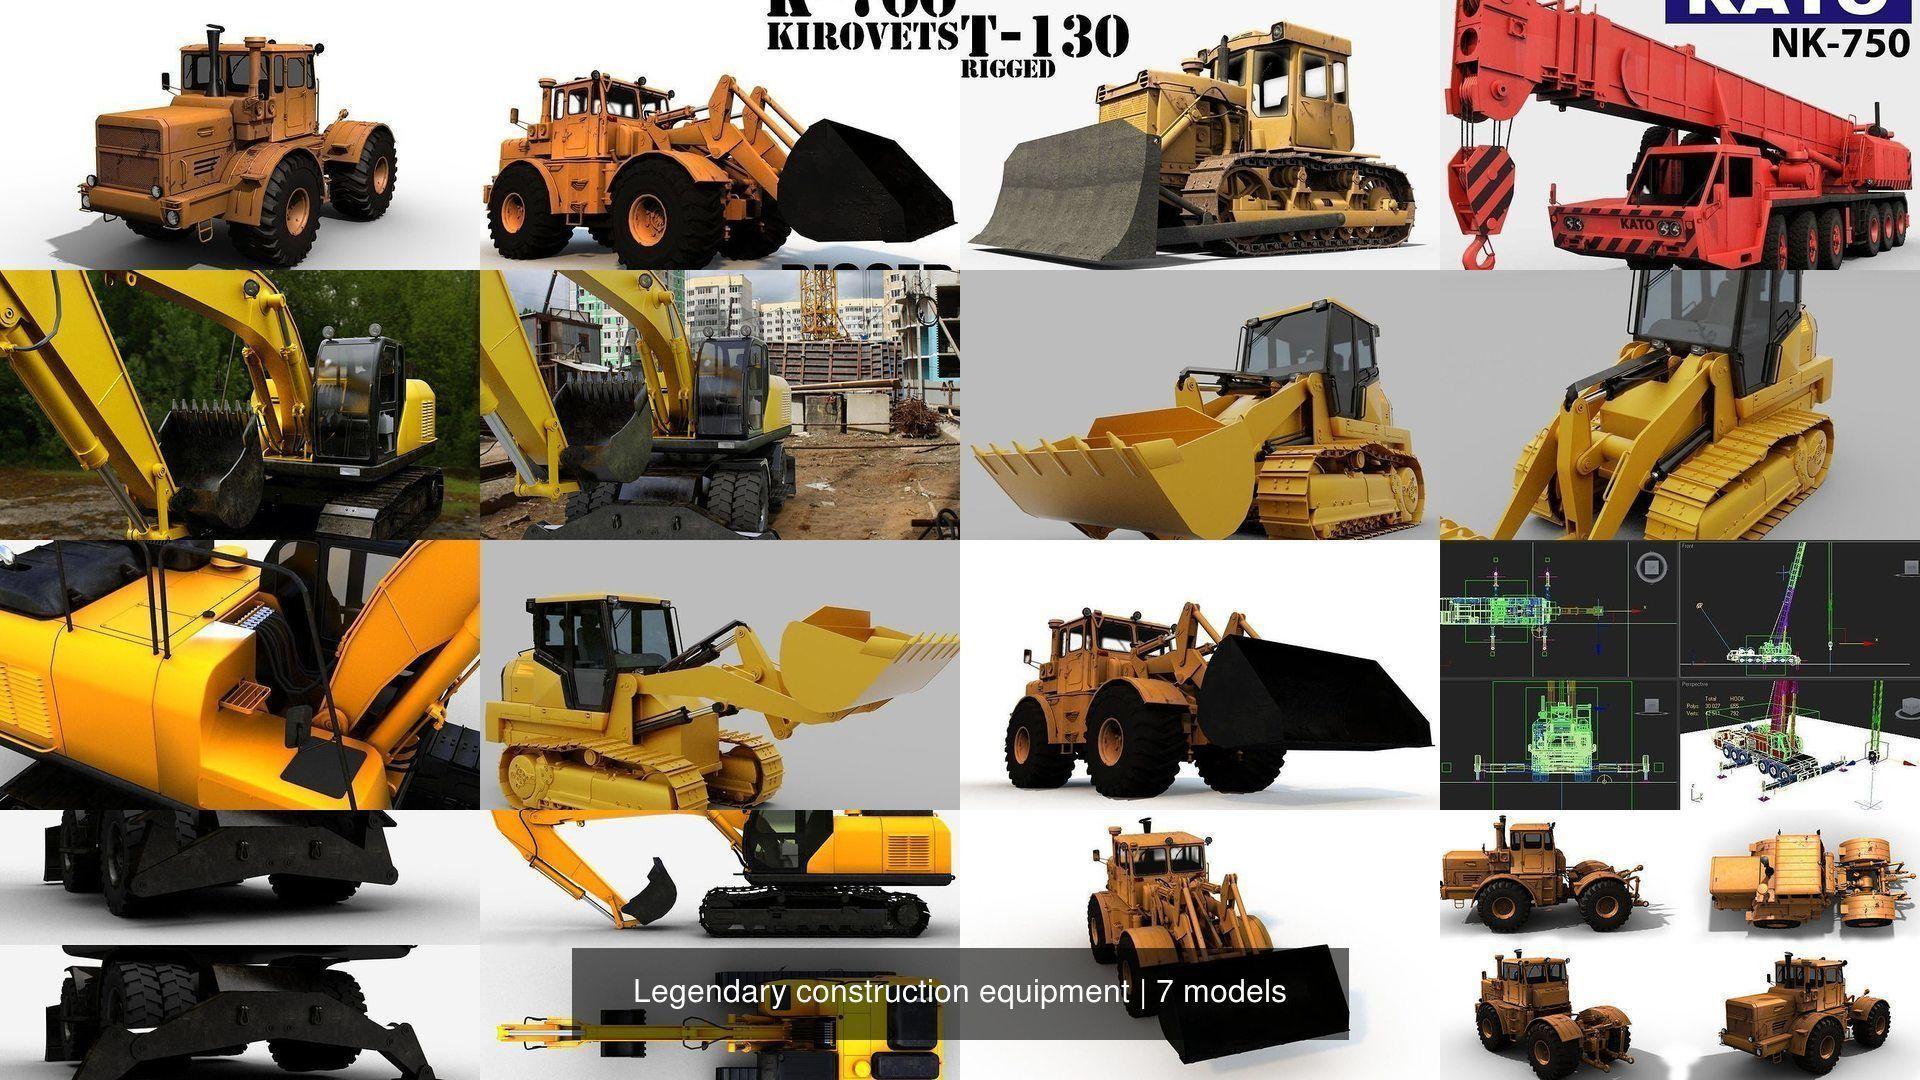 Legendary construction equipment